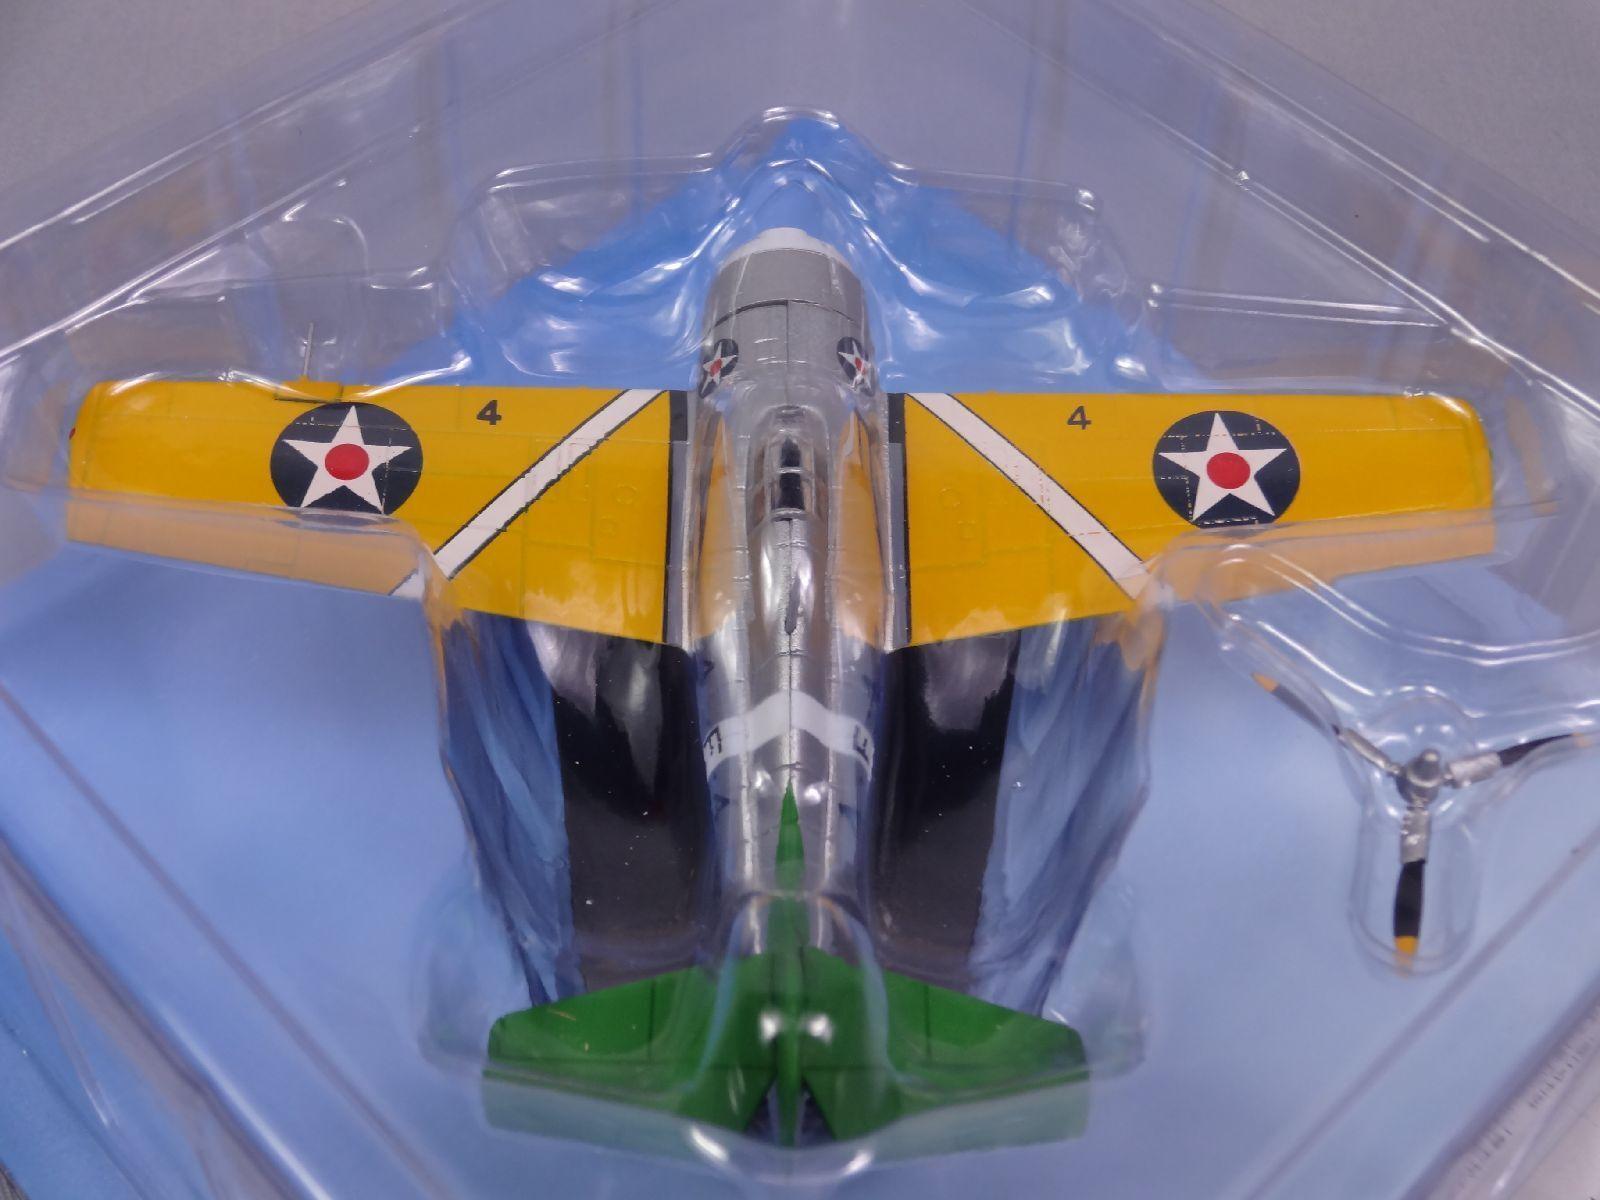 America Grumman F4F 3 Wildcat 1 1 1 87 Scale War Aircraft Japan Display PL156 365aff